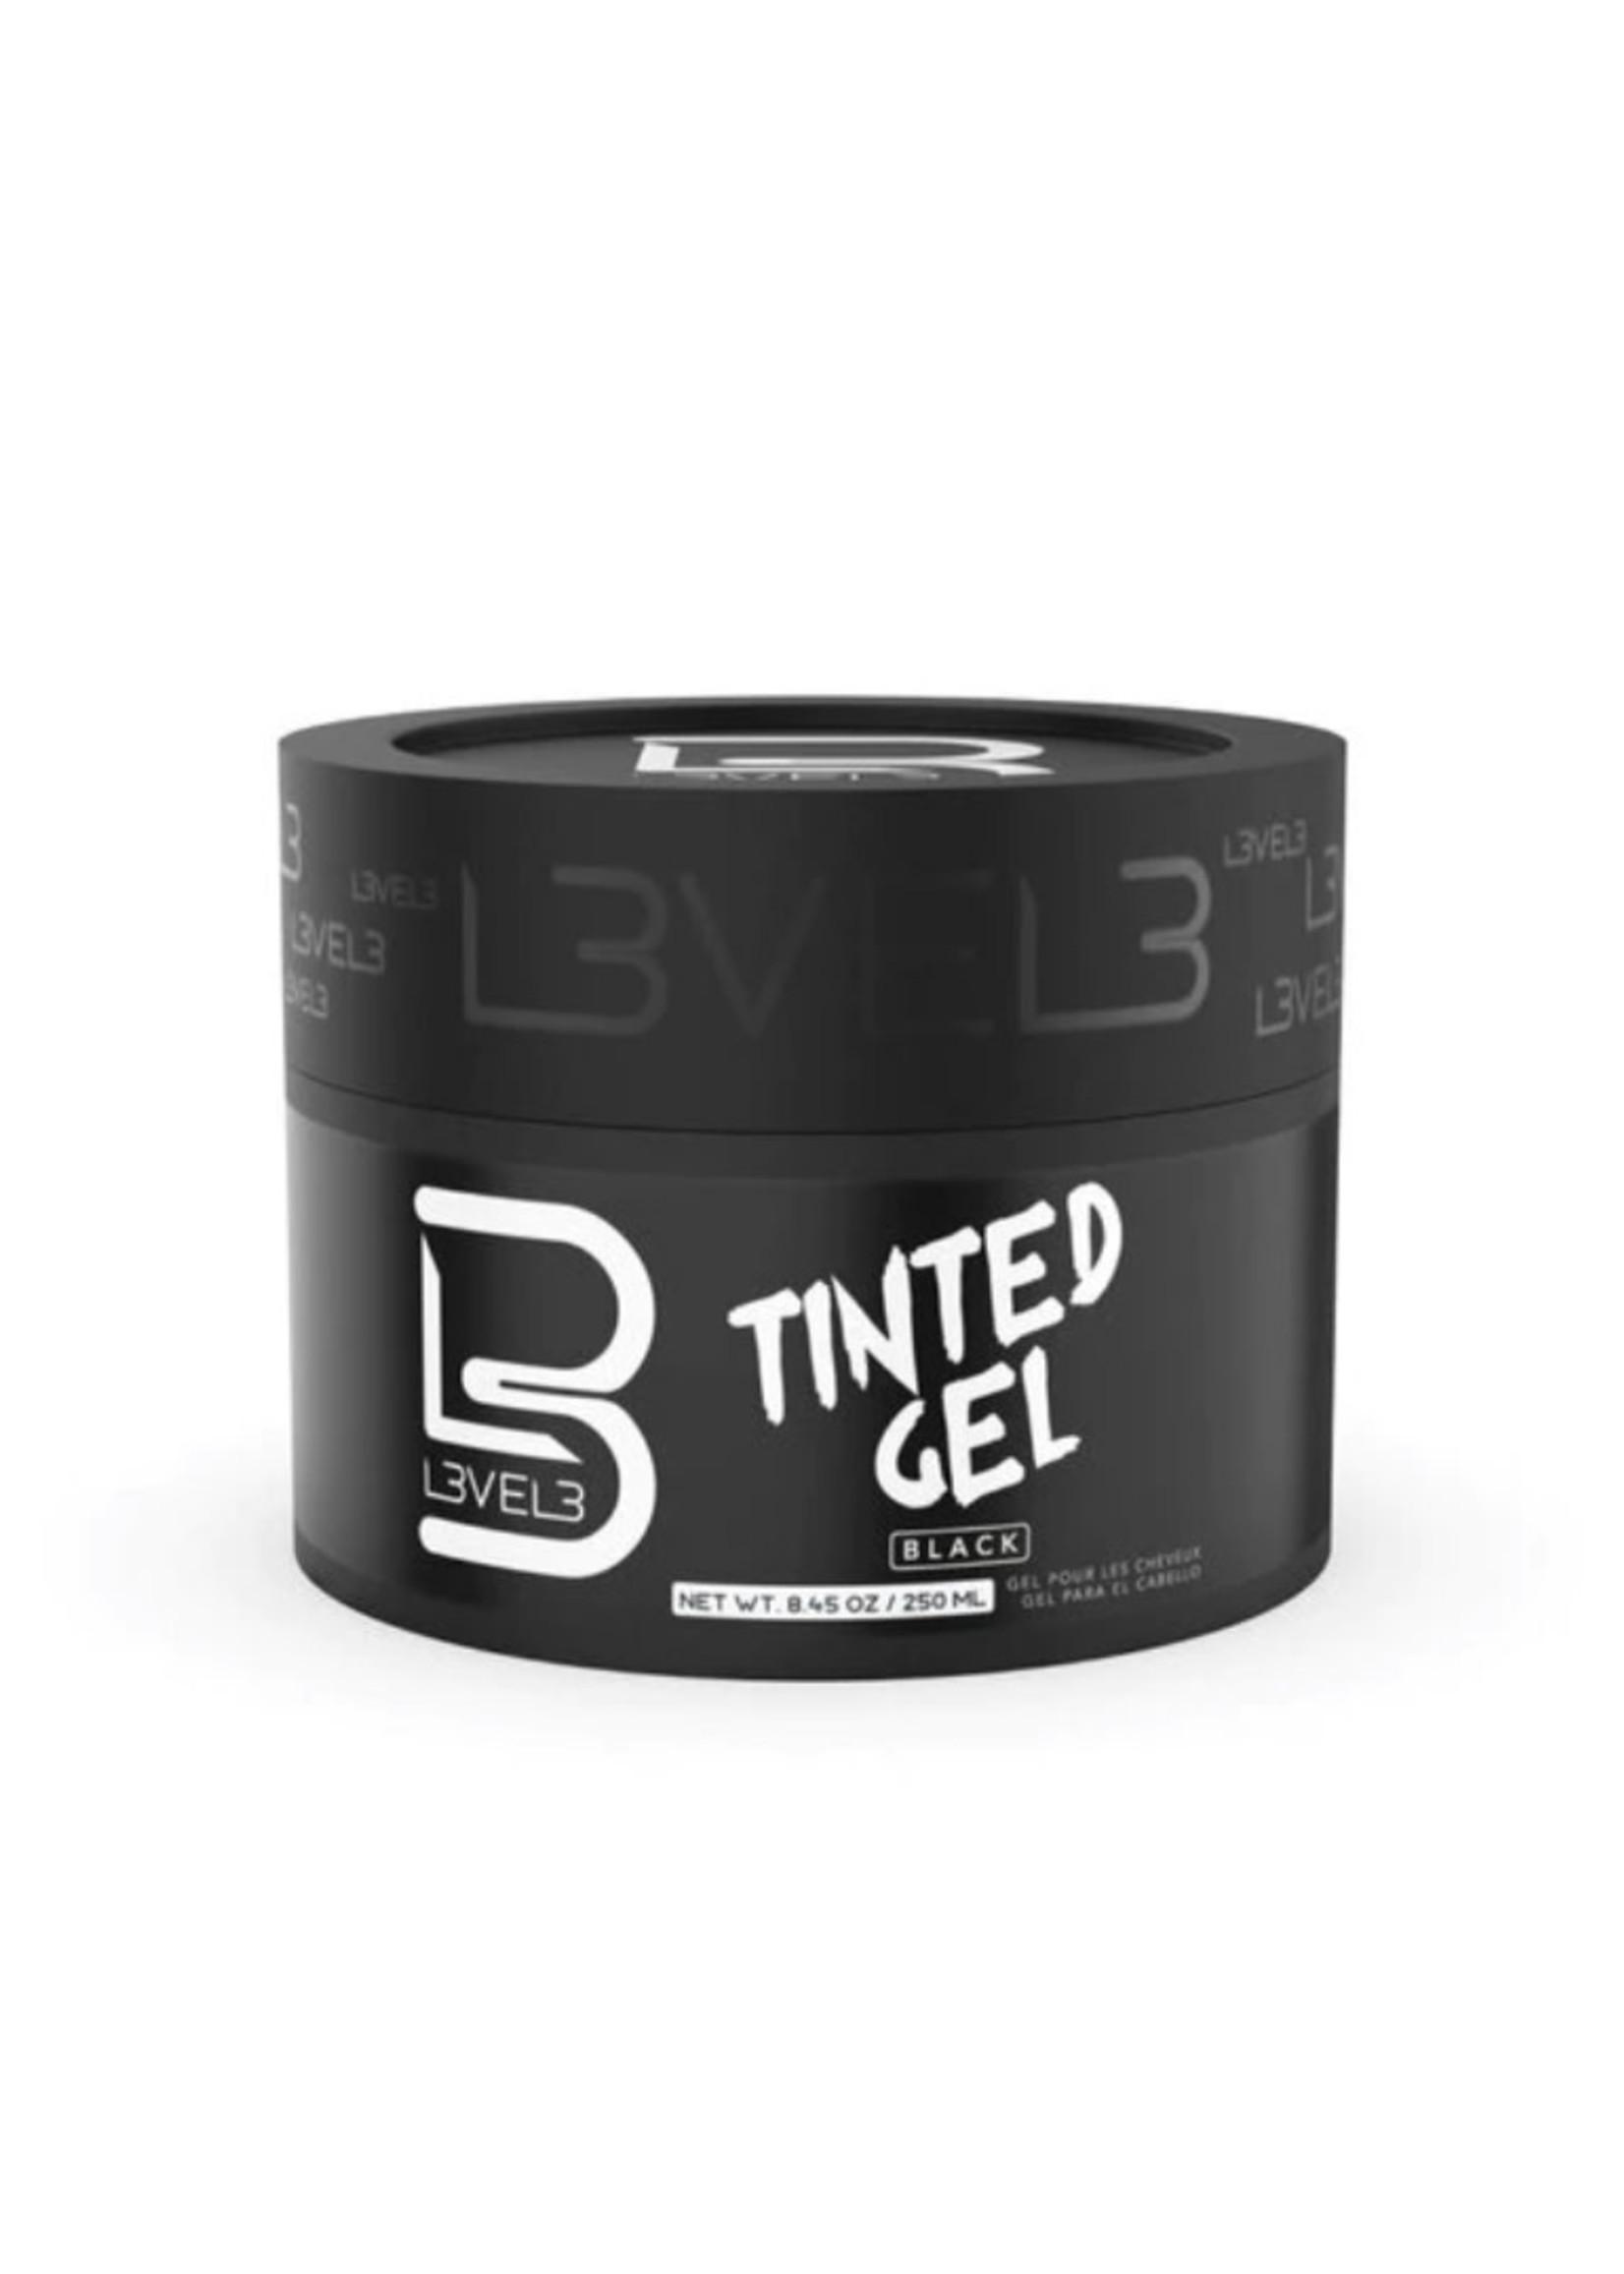 Level 3 L3 Tinted Hair Gel Black-250ML